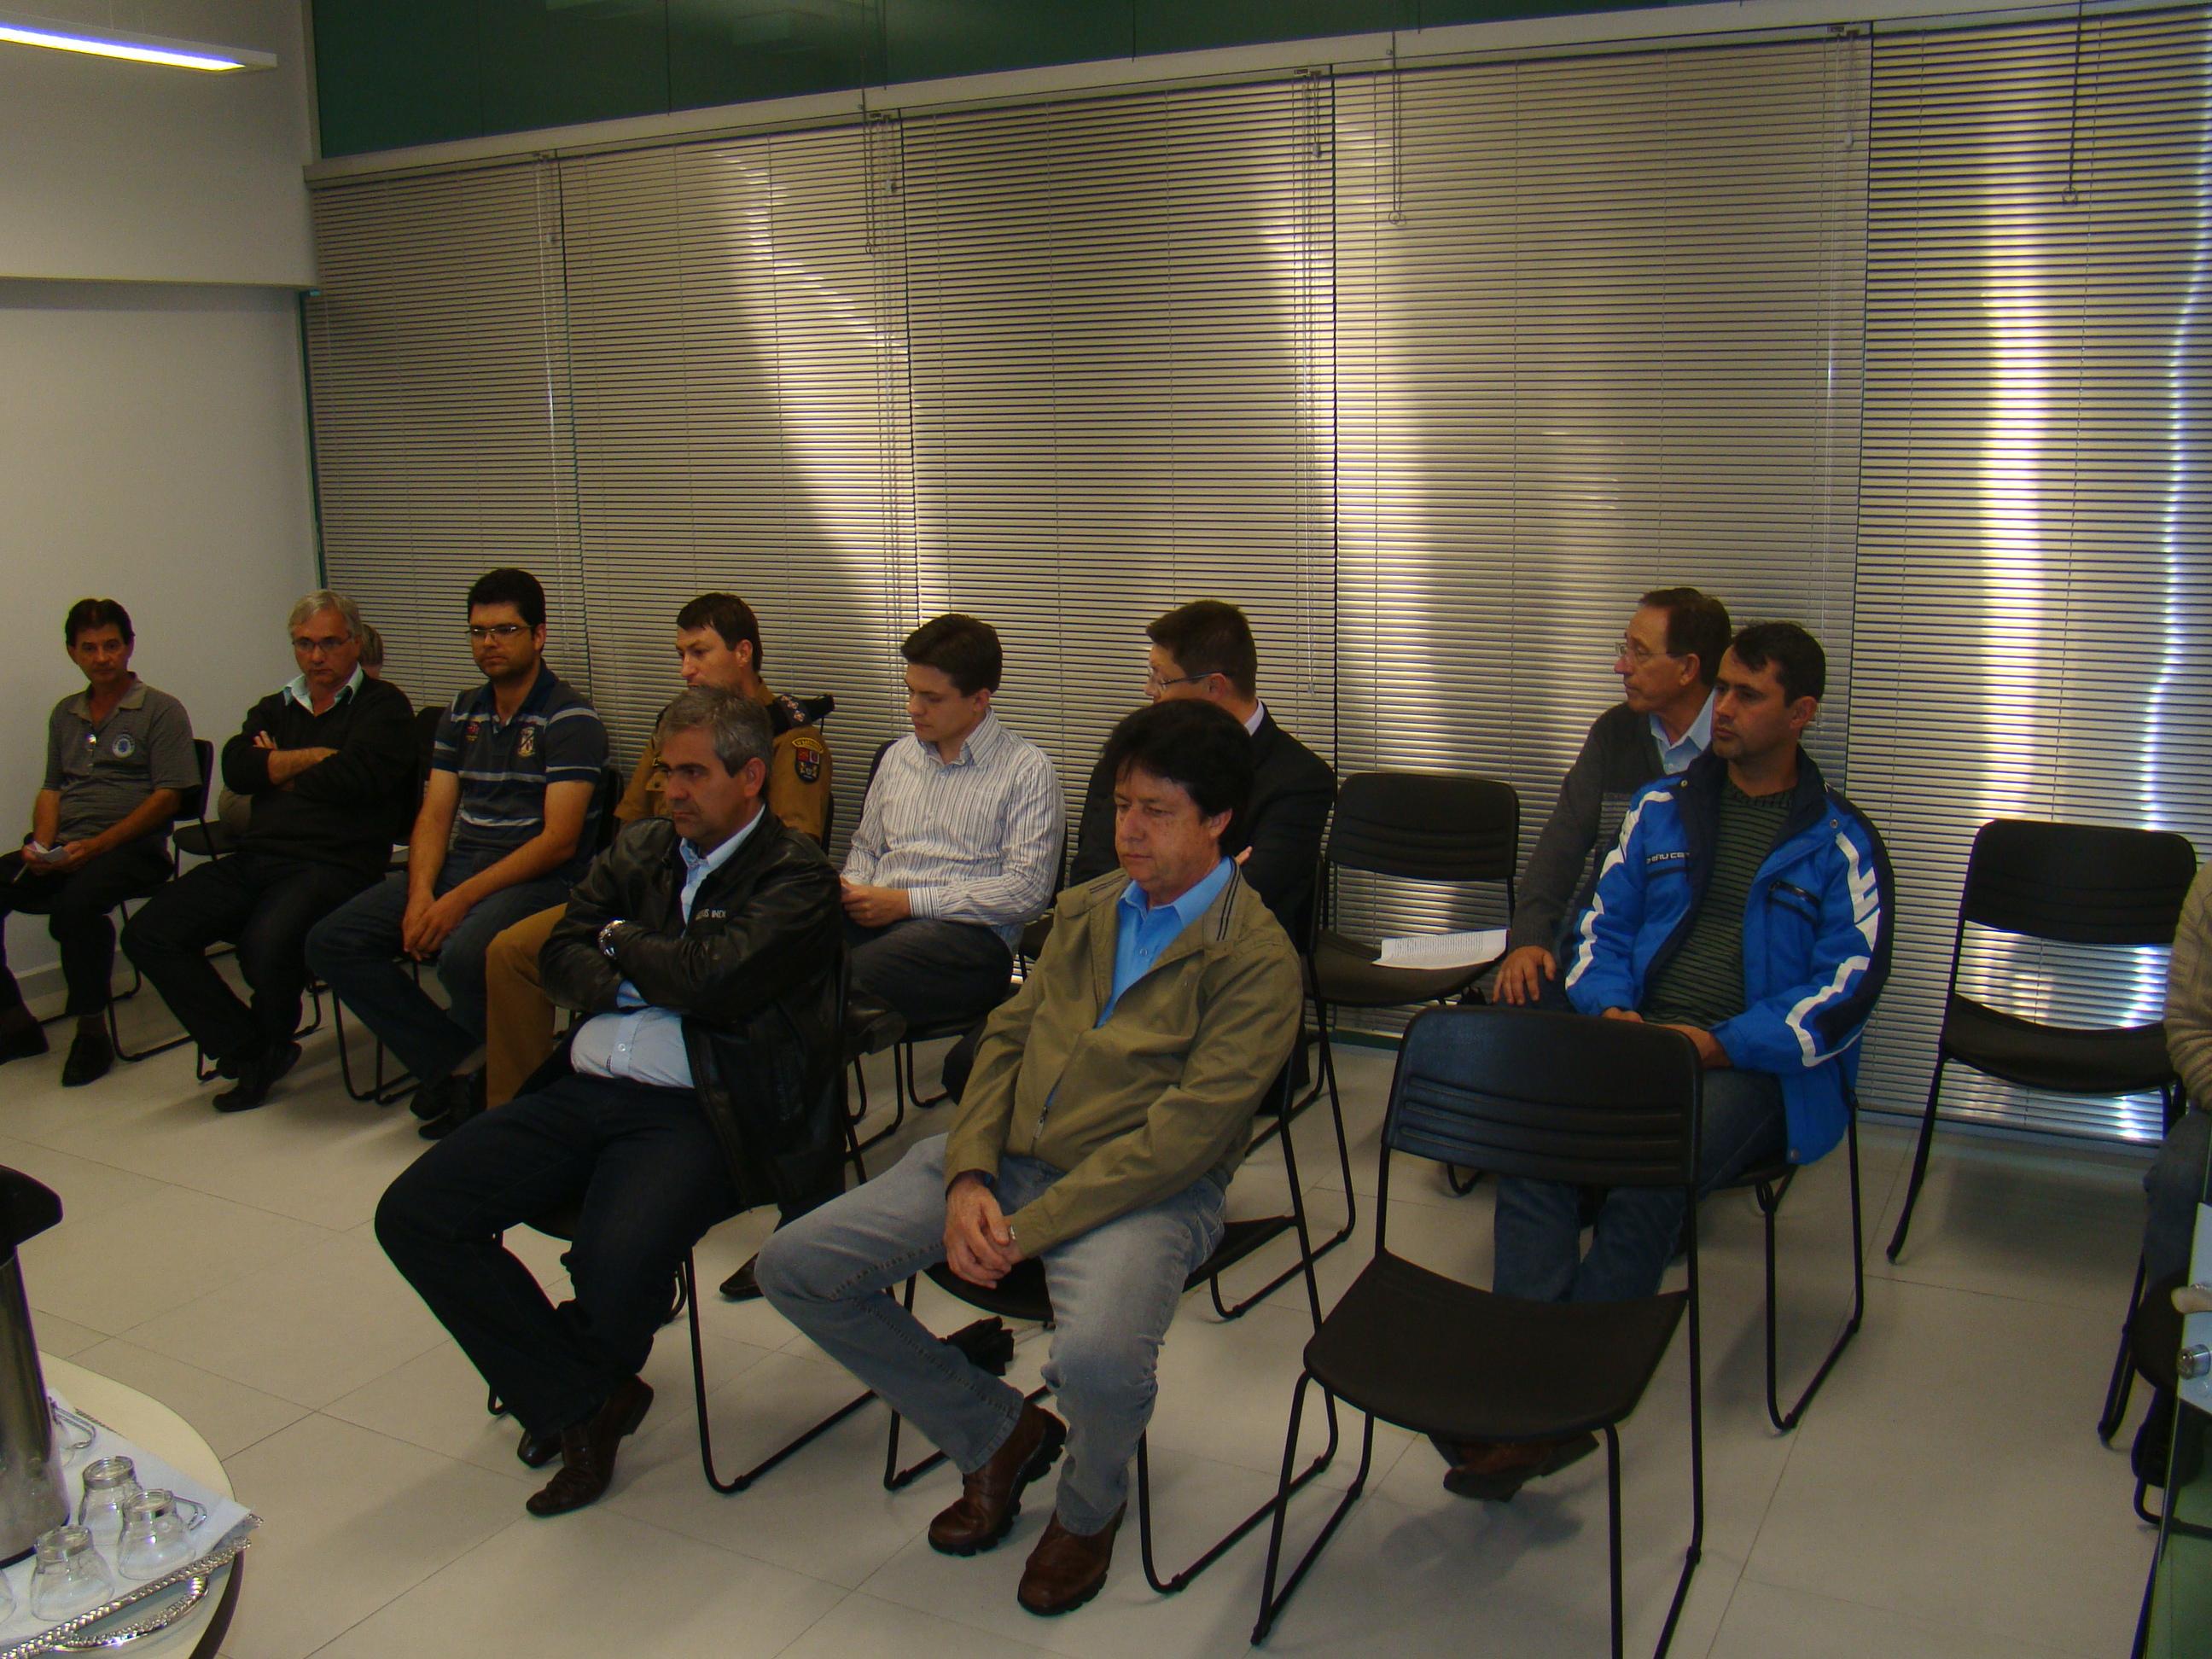 Representantes de diversas entidades participaram da Mesa Redonda do Tr�nsito